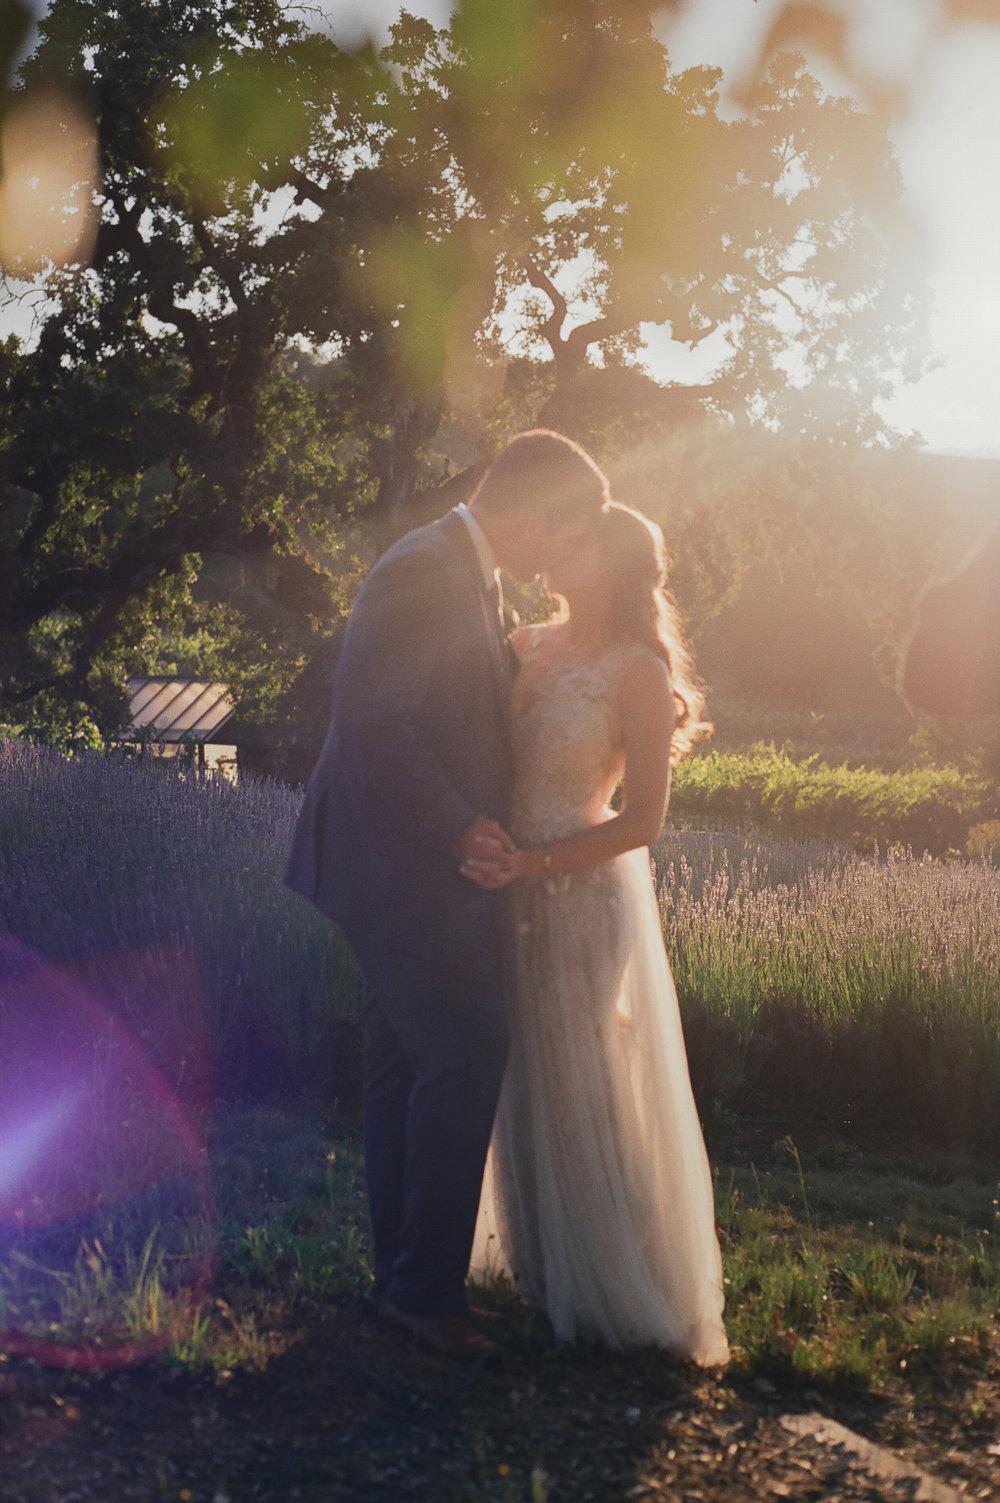 35mm-film-Michael-Megan-Wedding-Napa-2017-PRINT-034-2.jpg